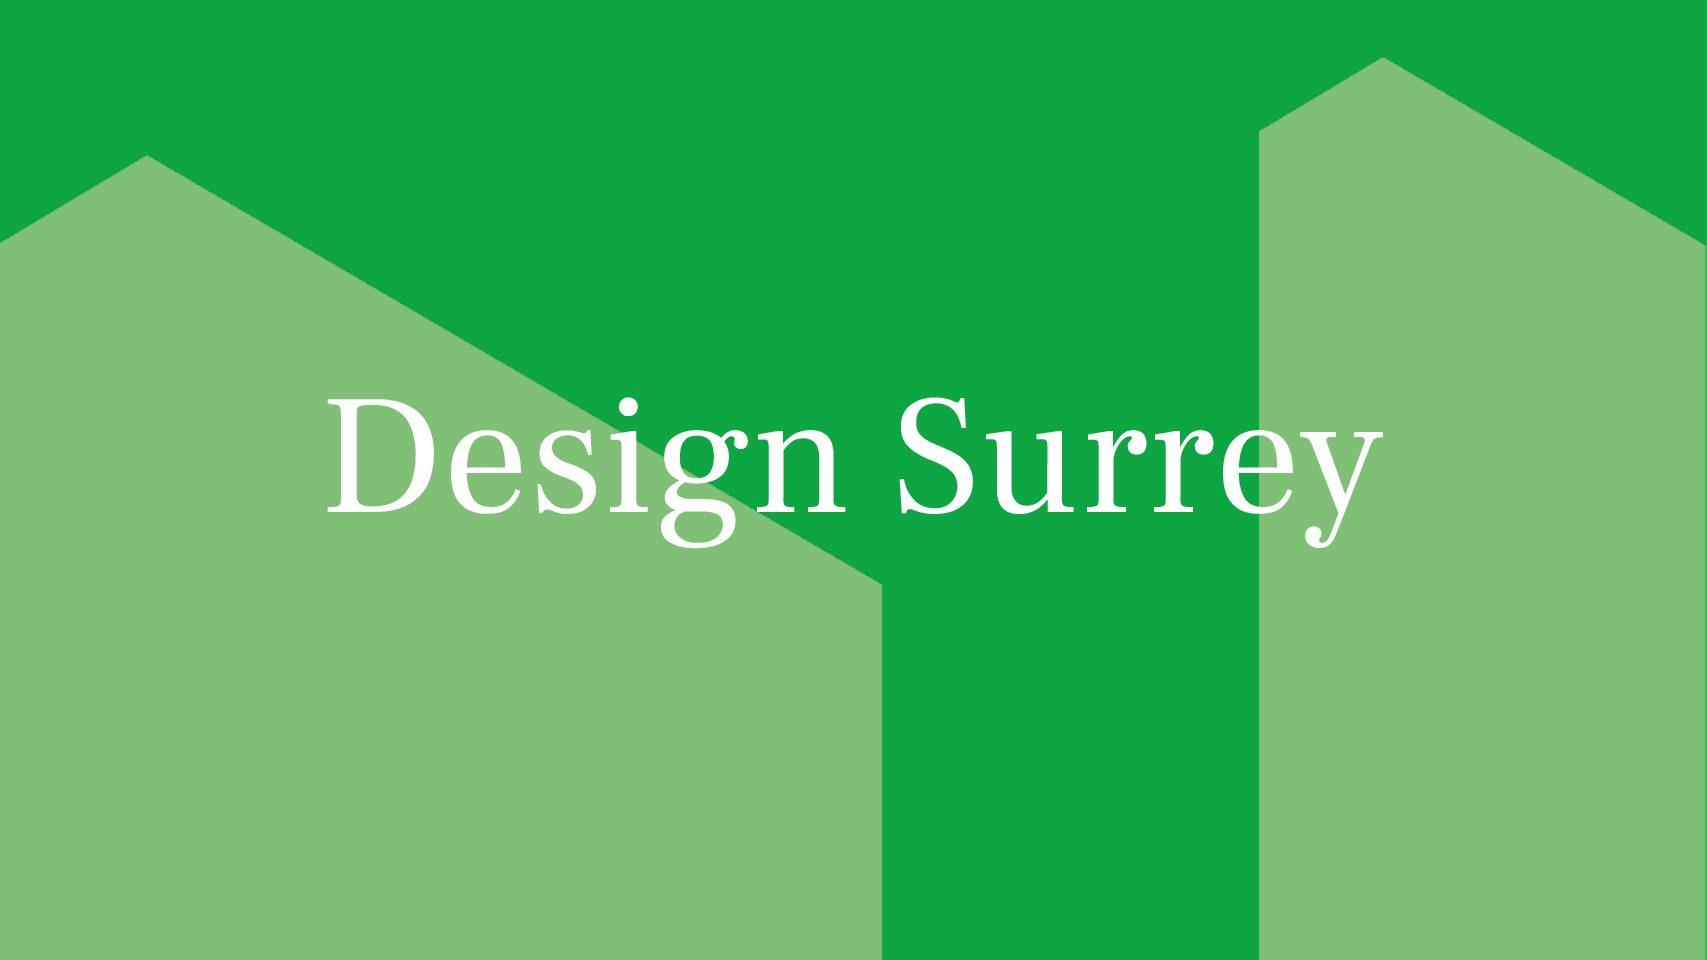 Design South East – Design Surrey